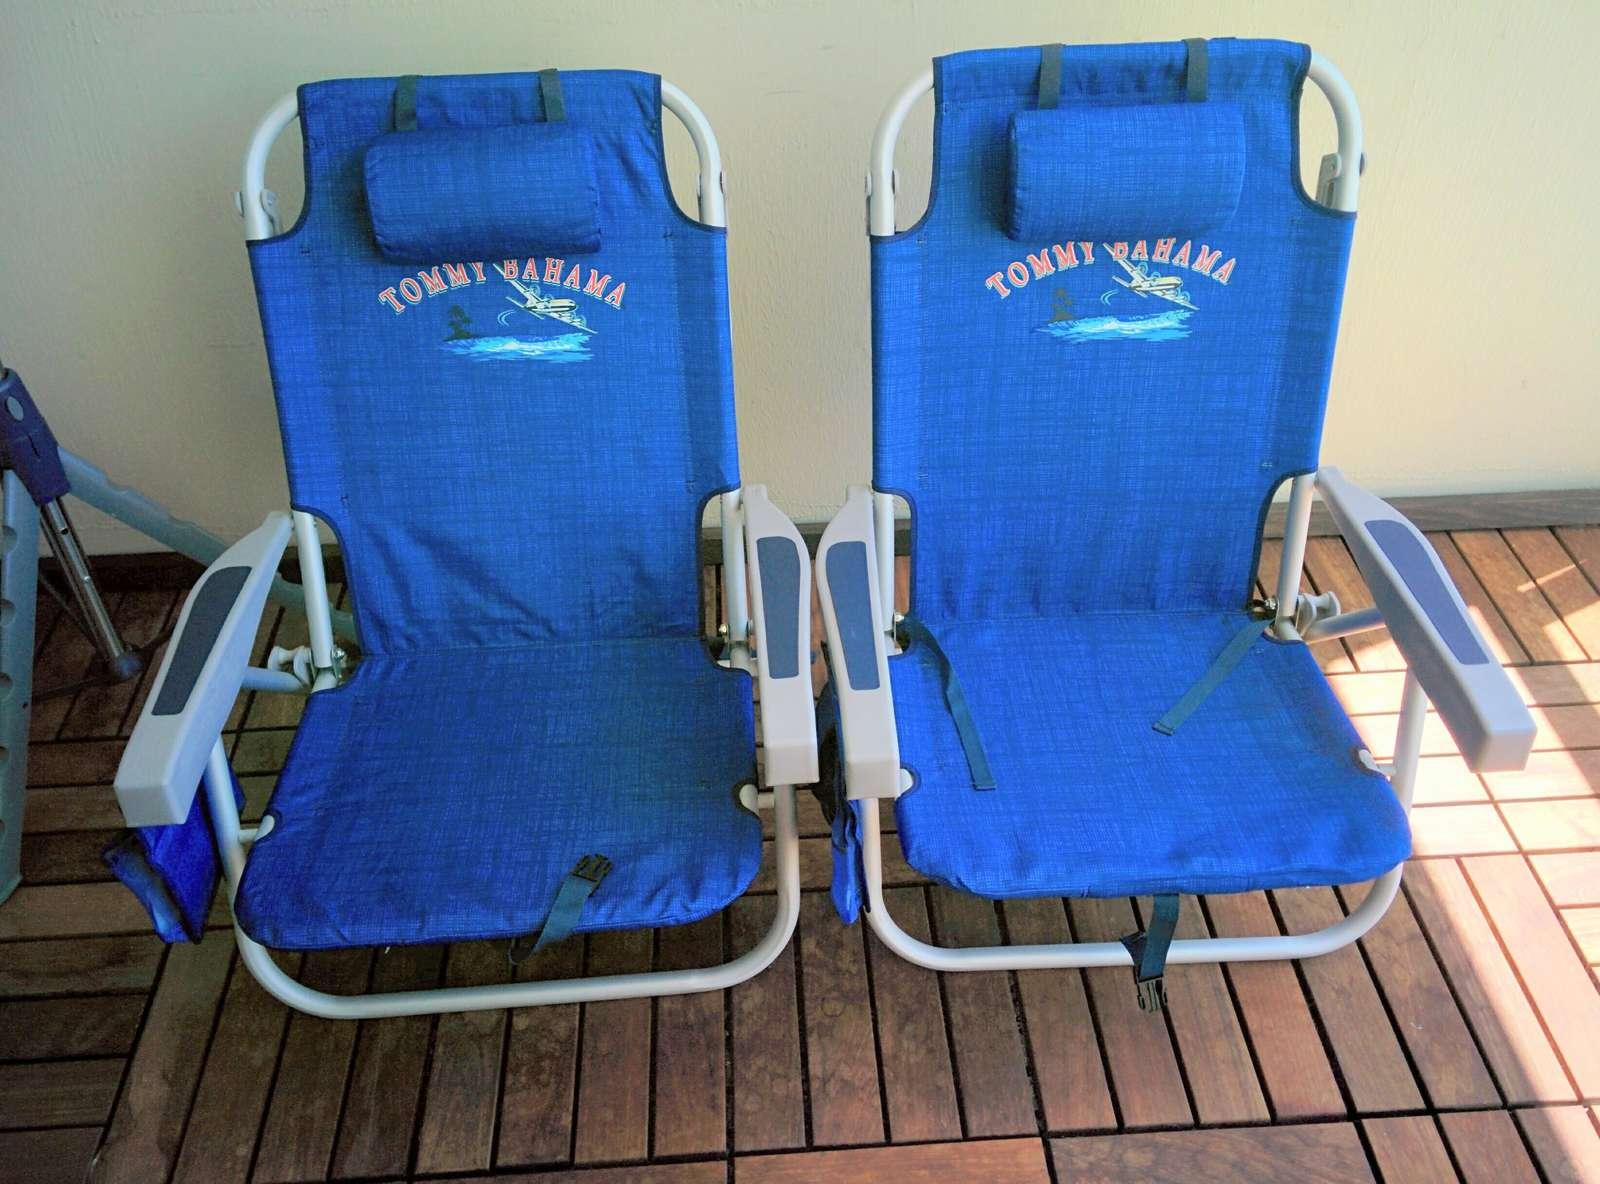 We provide 2 backpack beach chairs